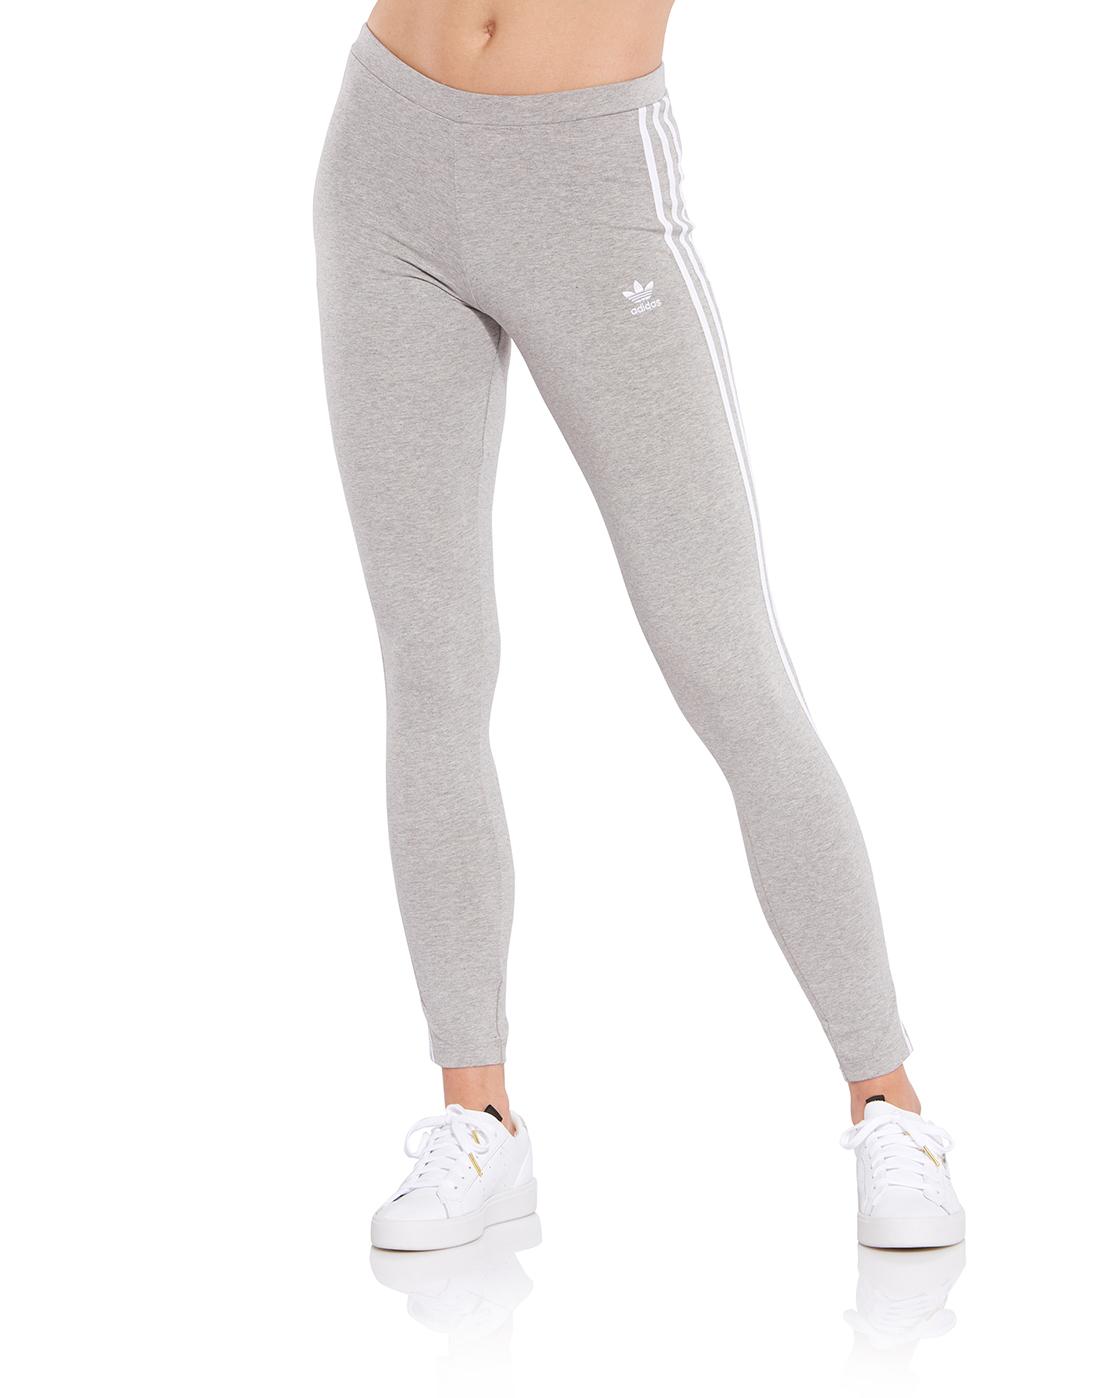 713515a4b9 Women's Grey adidas Originals 3 Stripe Leggings | Life Style Sports